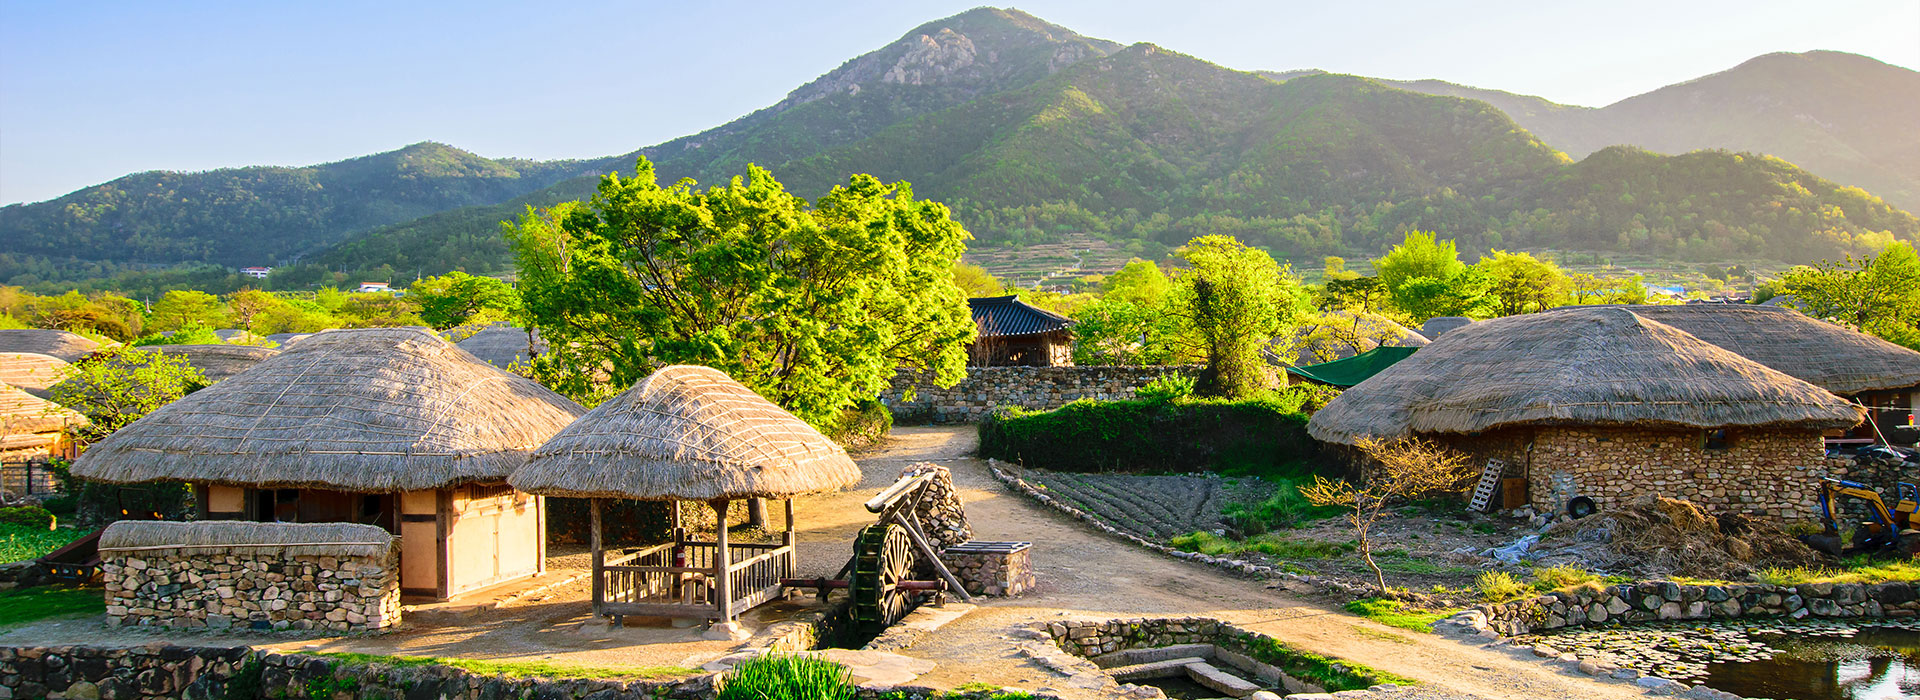 Reisen nach Südkorea - Individuelle Reisen nach Südkorea - Harry Kolb AG - Tourismus